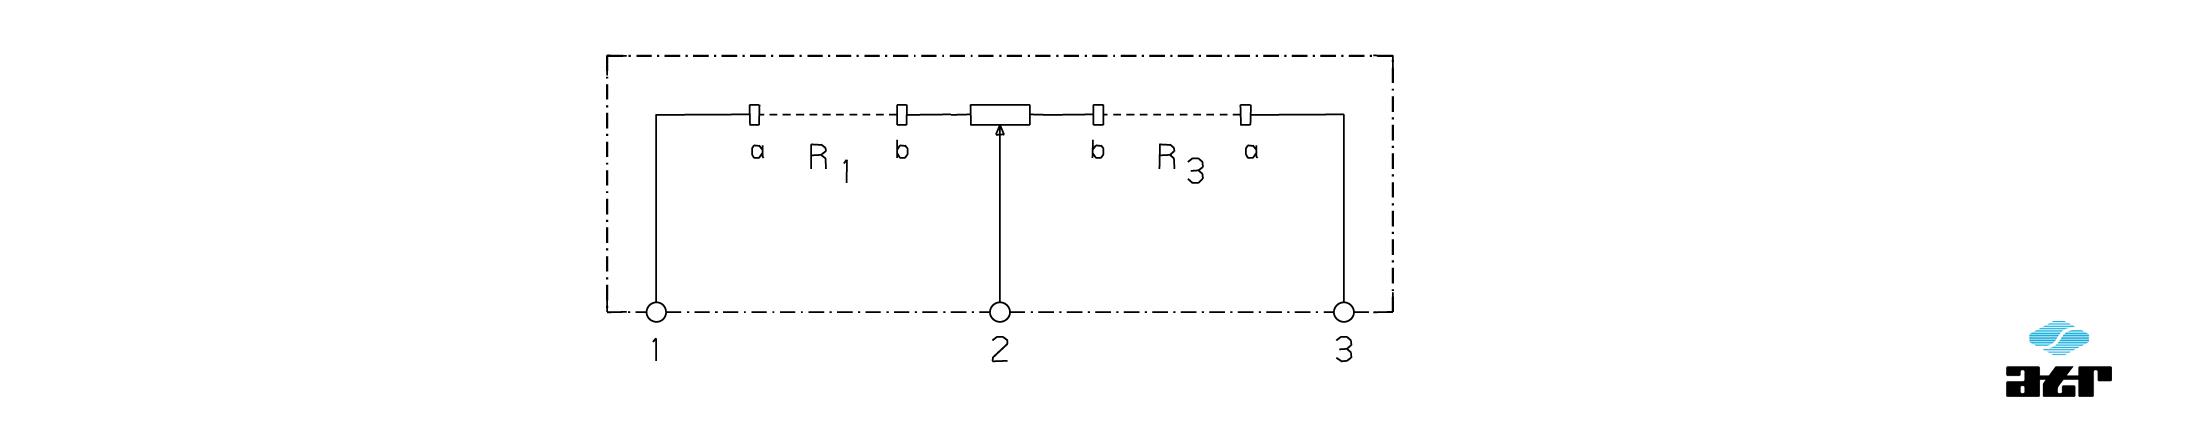 Anschlussplan: ATR Potentiometer-Einheit UG5 + UG6